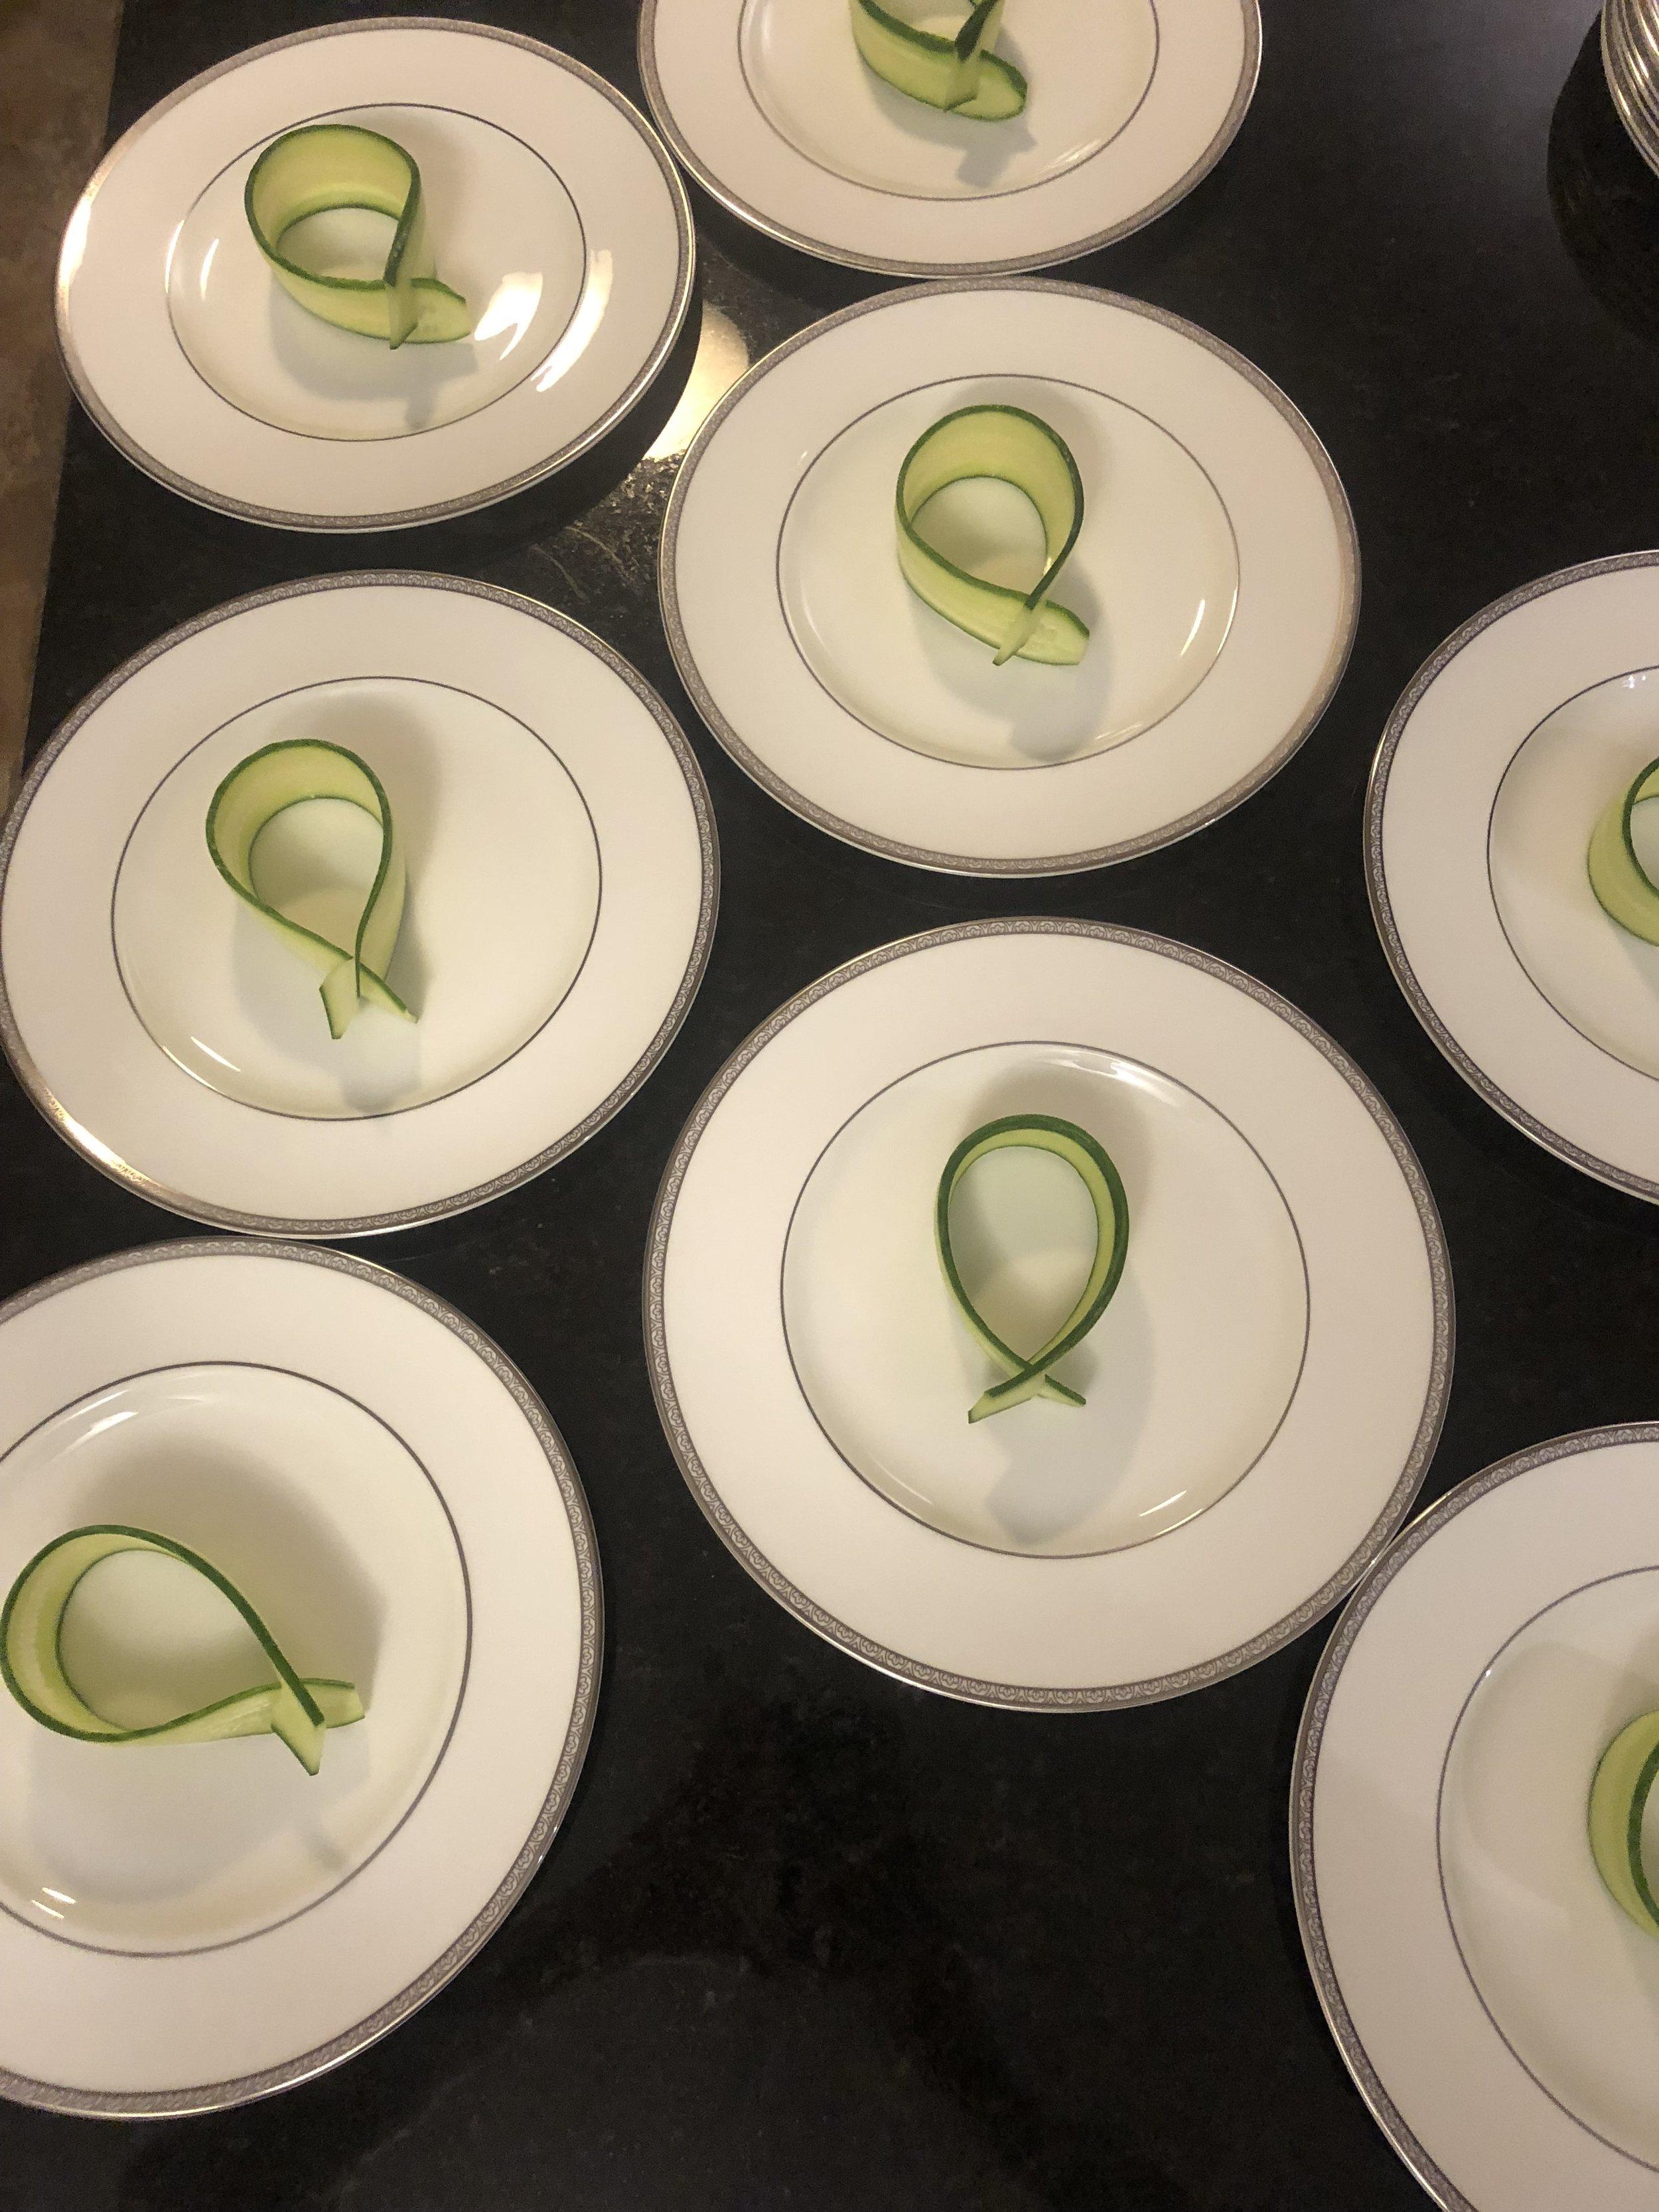 haha they look like cucumber fish :)